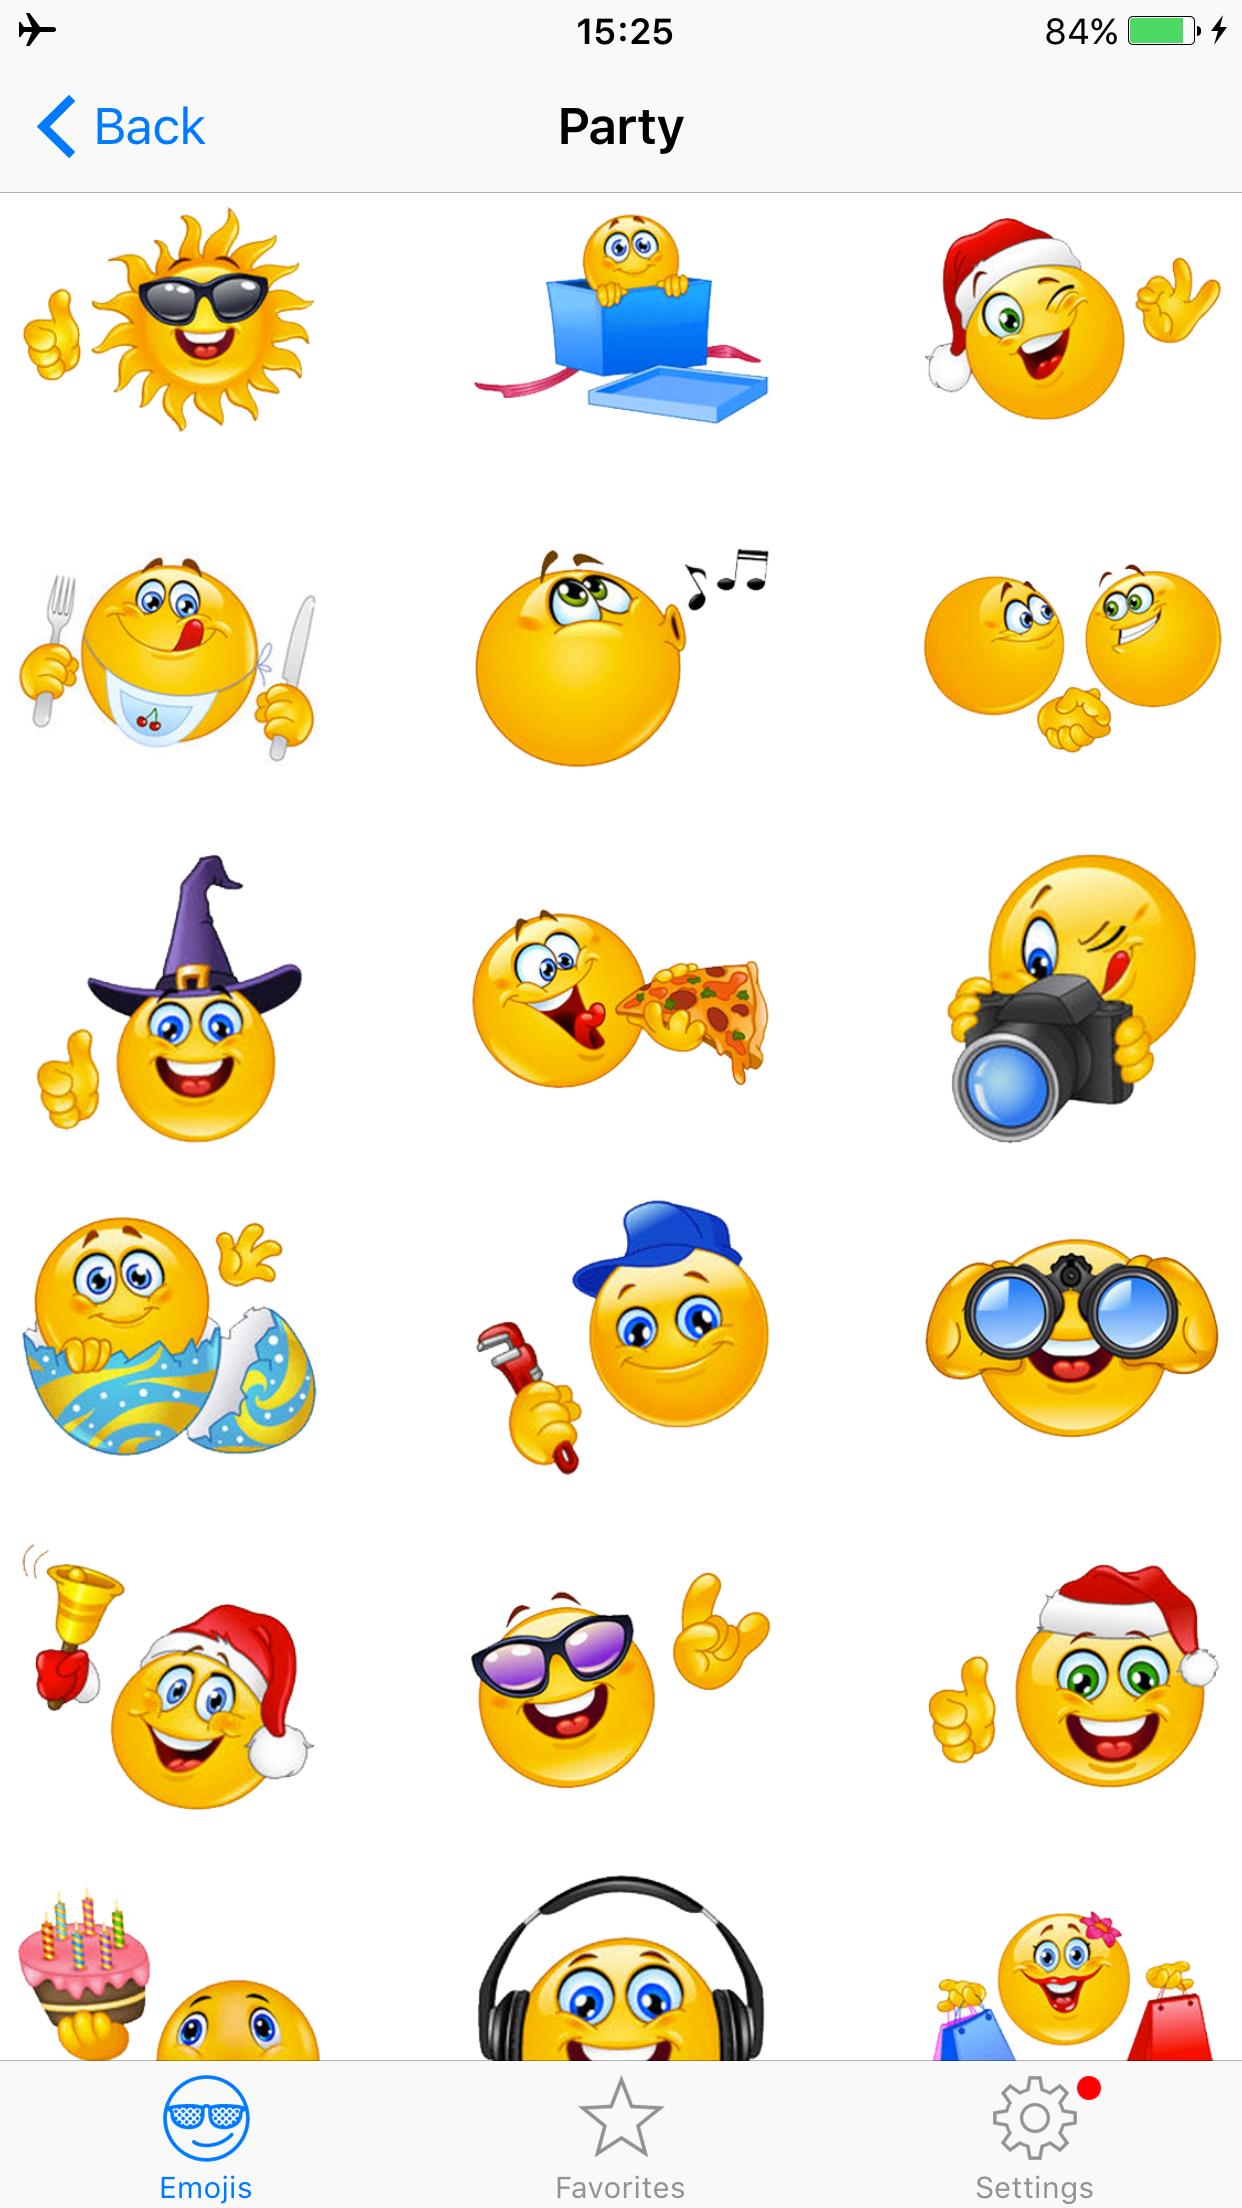 Adult emojis icons pro naughty emoji faces stickers keyboard adult emojis icons pro naughty emoji faces stickers keyboard emoticons for texting biocorpaavc Images